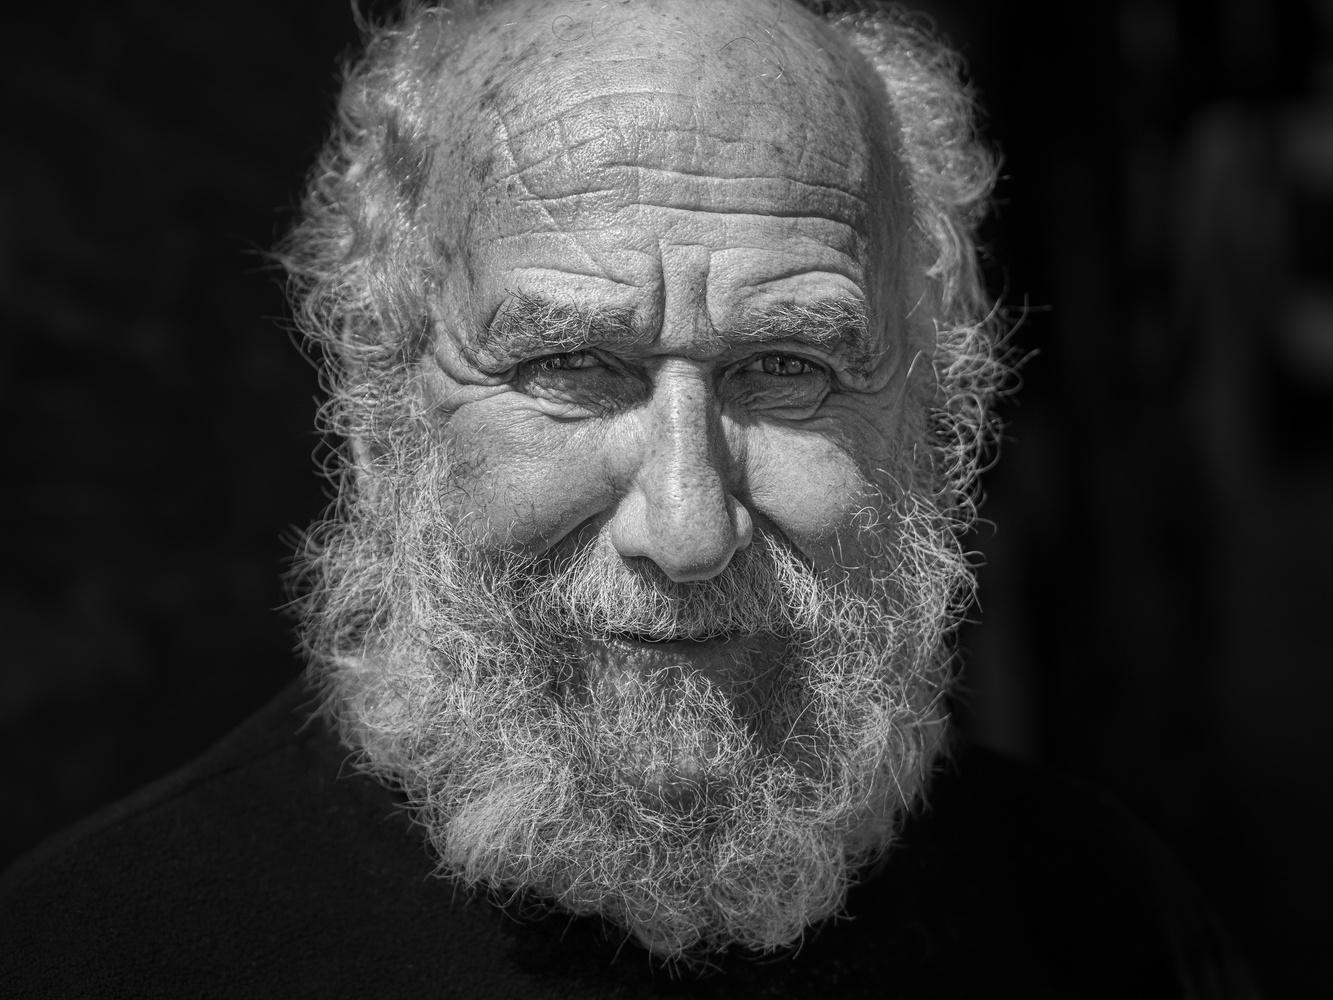 Street Portrait of Old Diver by Tomasz Kowalski